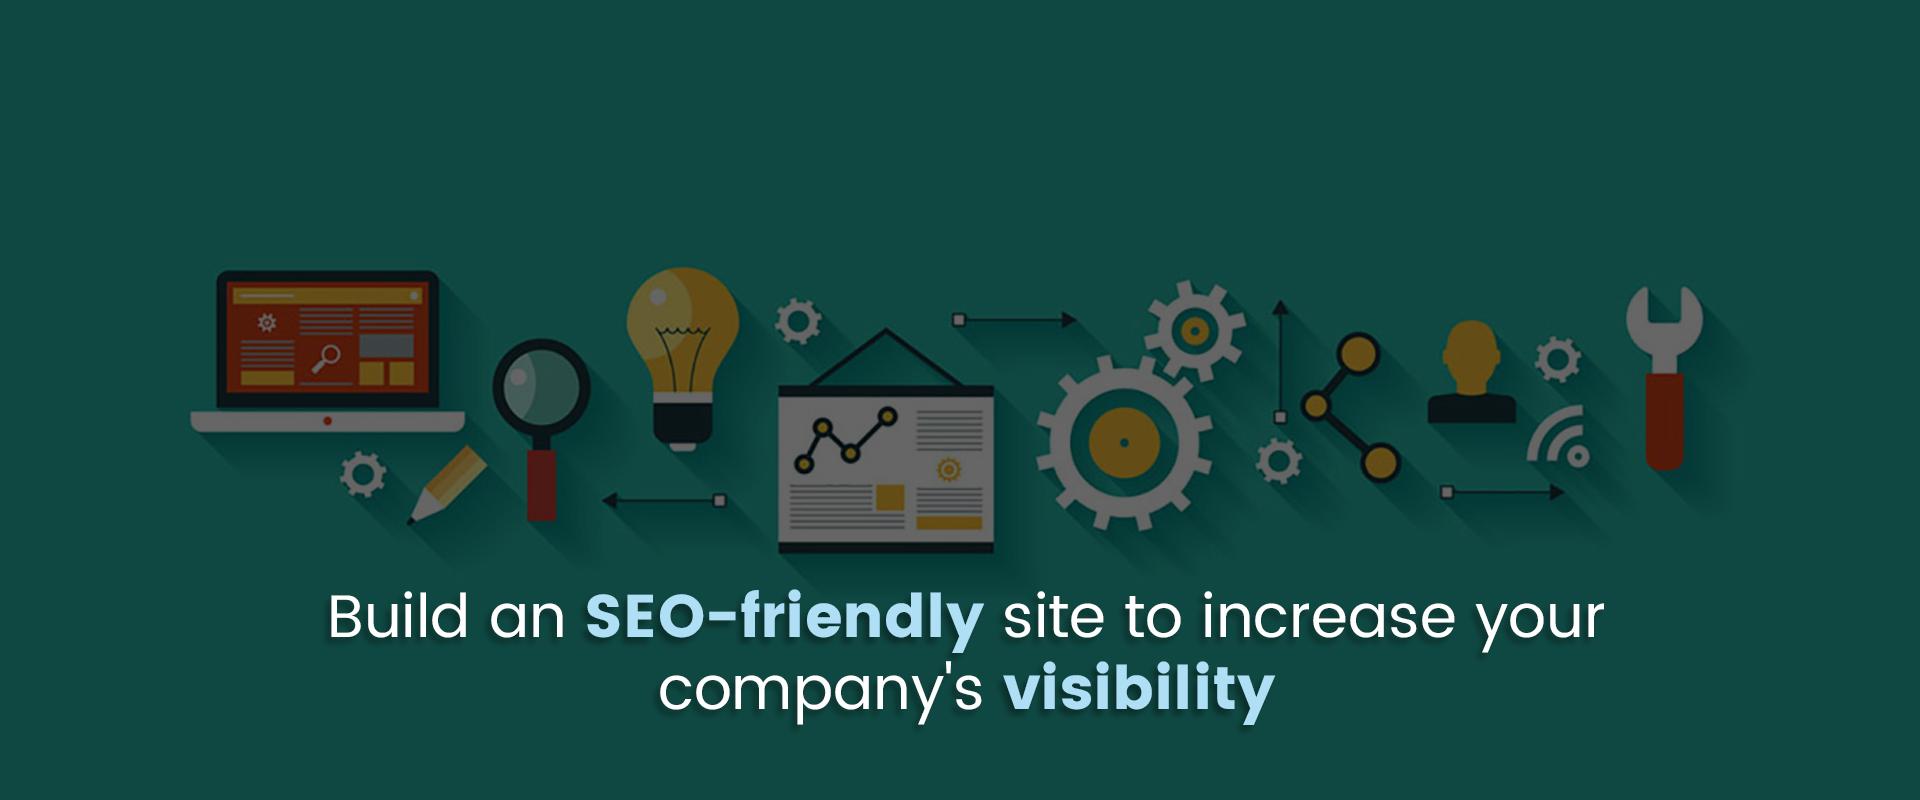 Search Engine Marketing (SEM) Services London UK